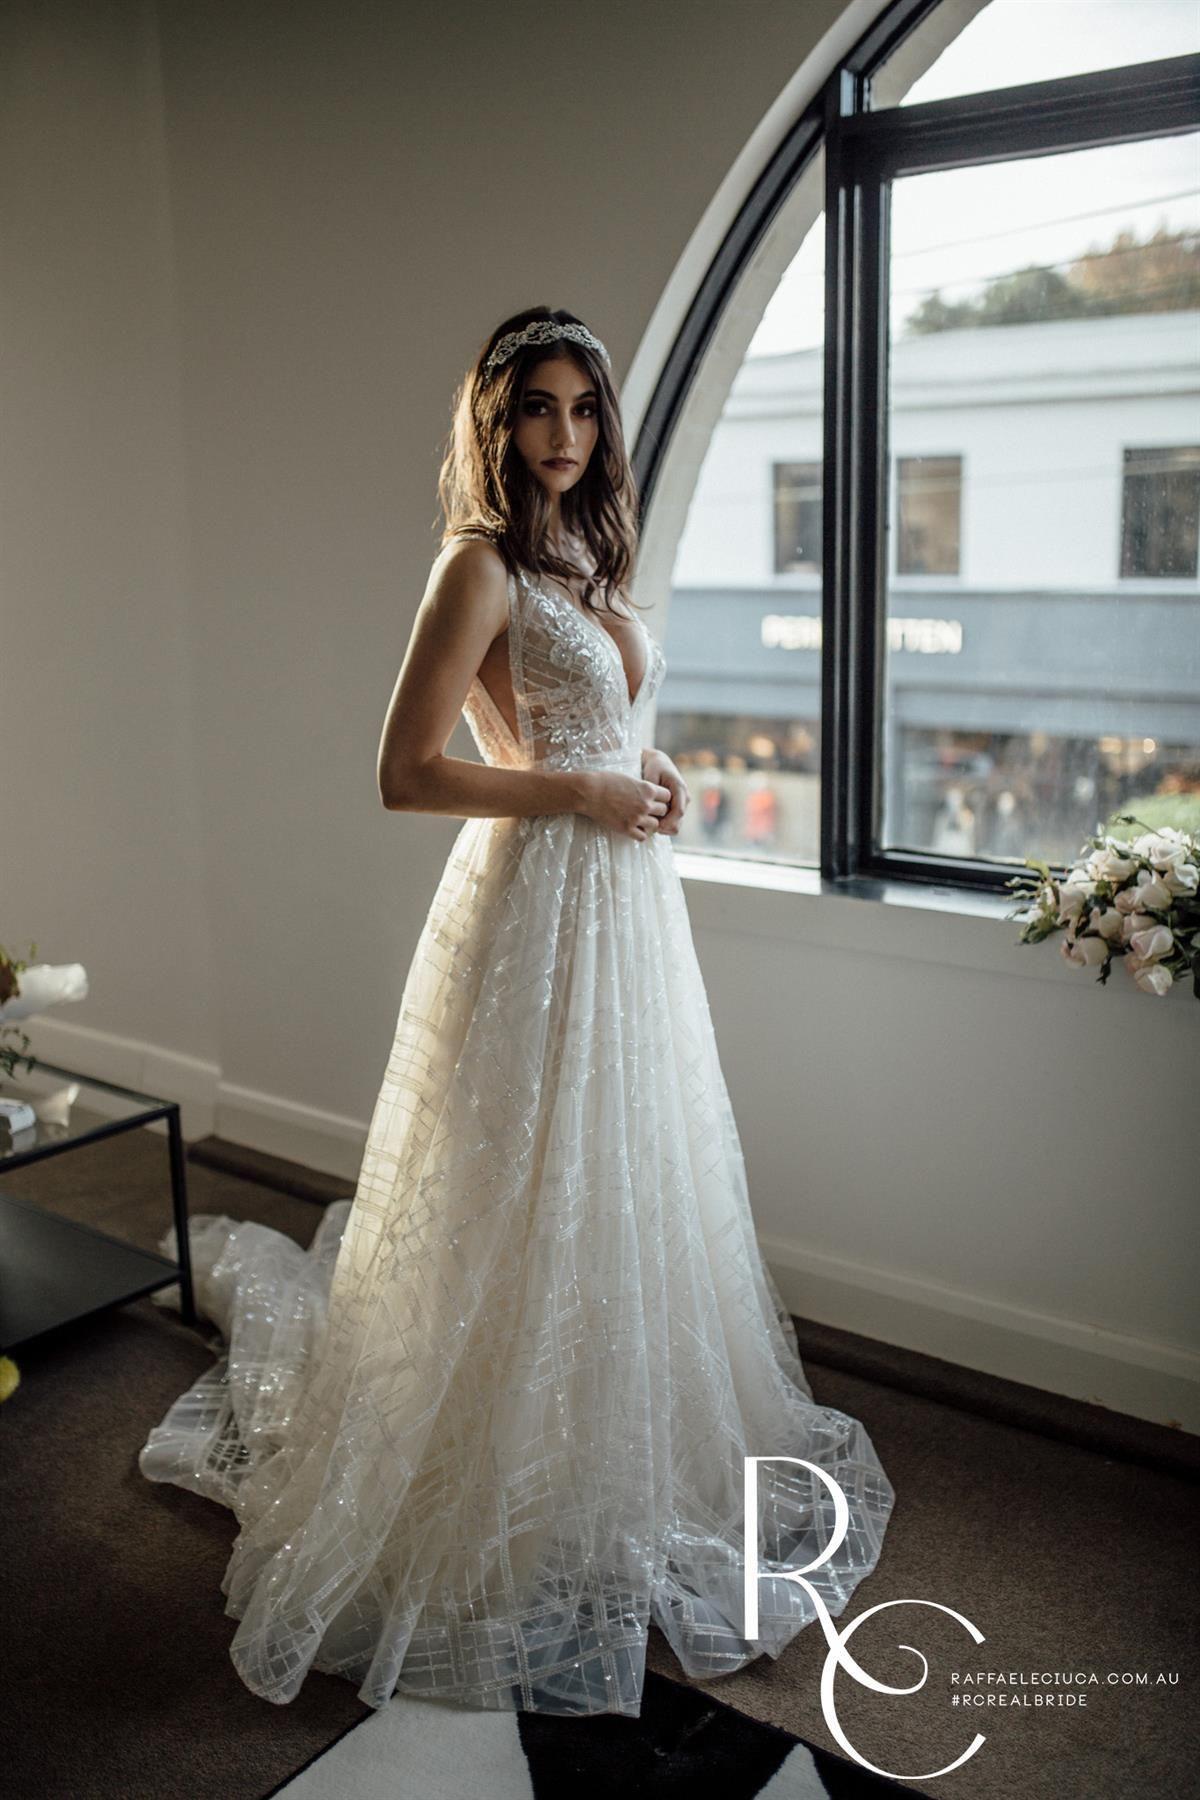 Bridal Gowns Melbourne Raffaele Ciuca Melbourne's